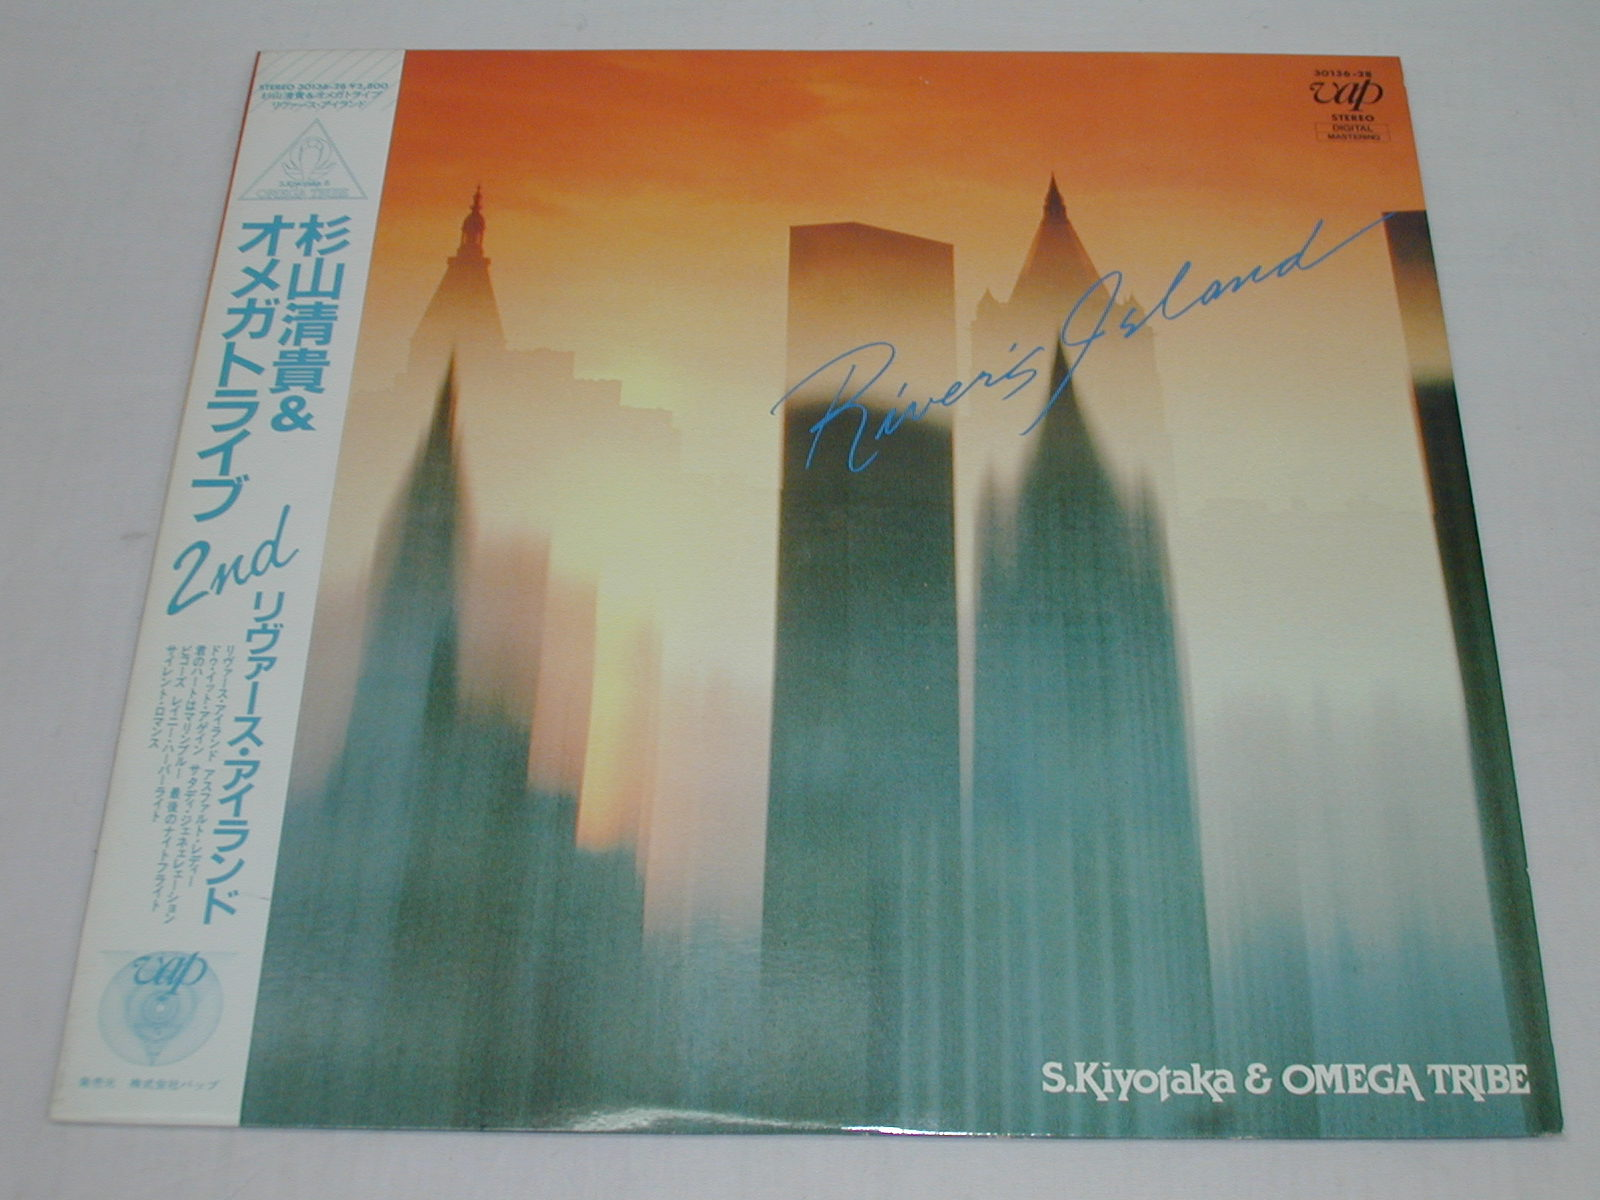 (LP)杉山清貴 & オメガトライブ/リヴァース・アイランド 【中古】